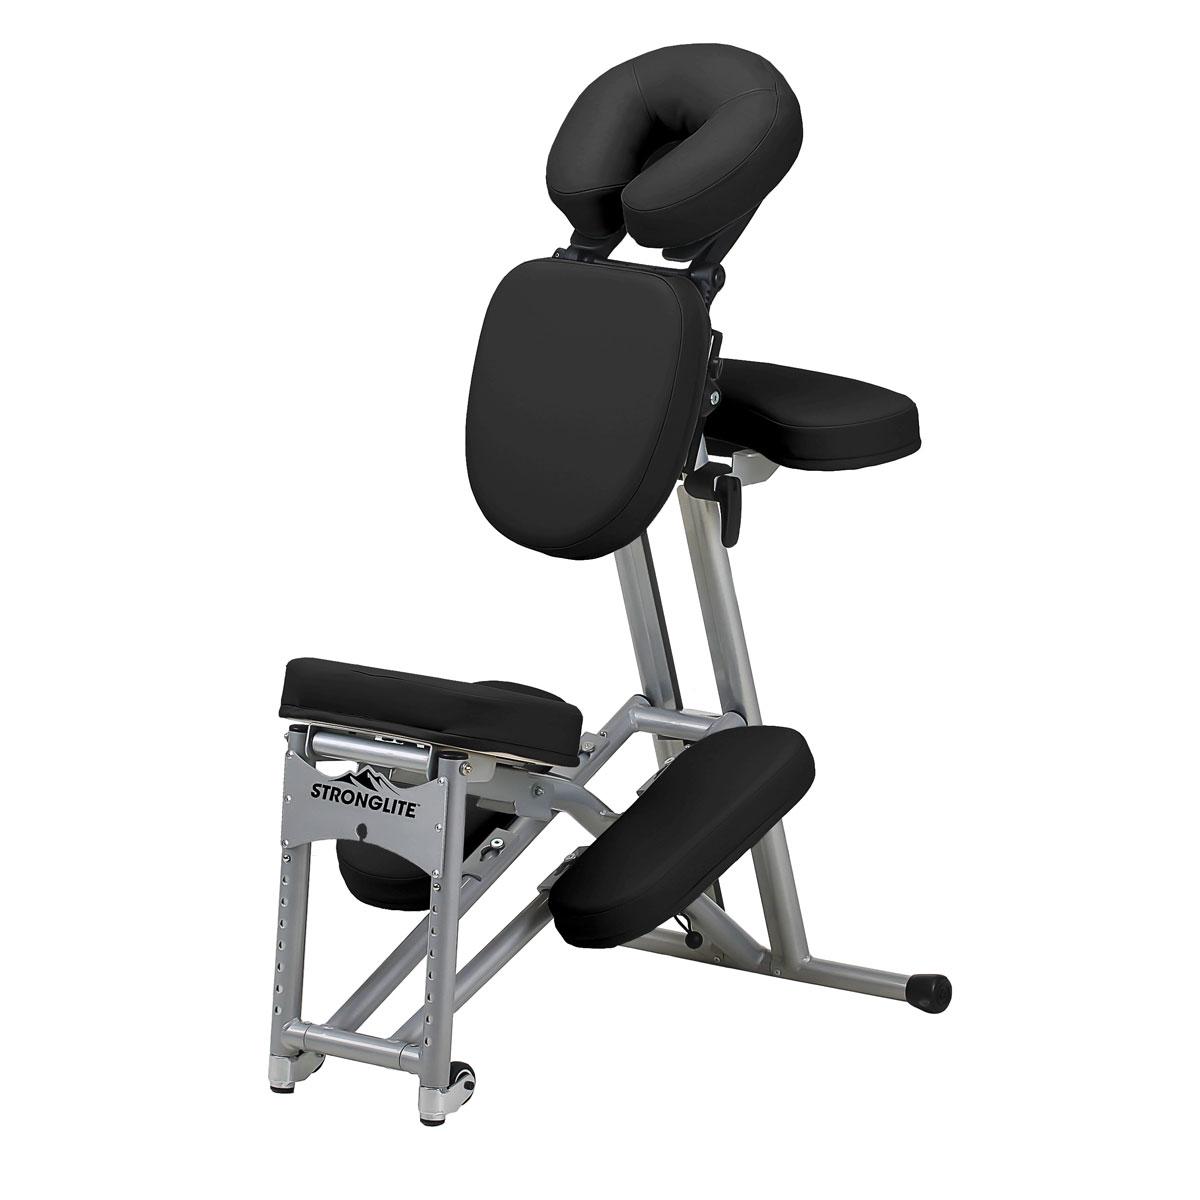 Stronglite Ergo Pro II Massage Chair Package  Ergo Pro Chair